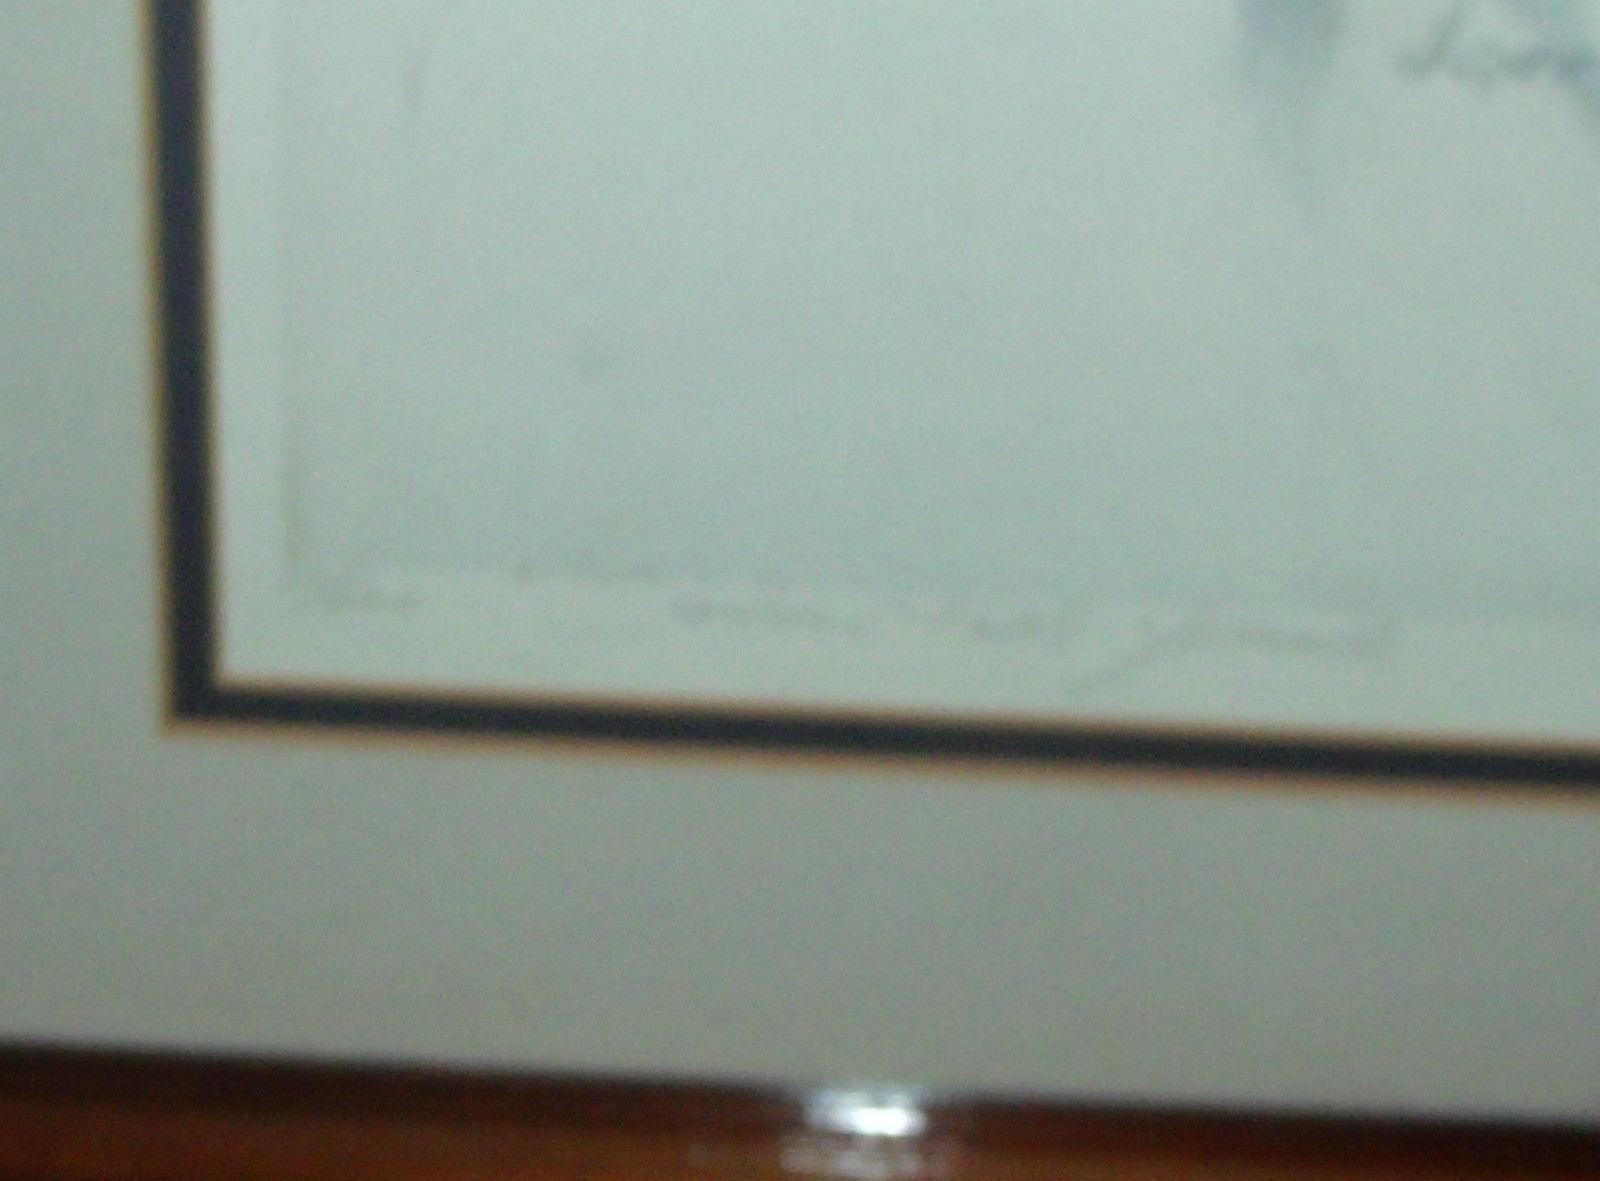 JANE GYER SENTINEL FALLS YOSEMITE FRAMED LIMITED EDITION SIGNED LITHOGRAPH